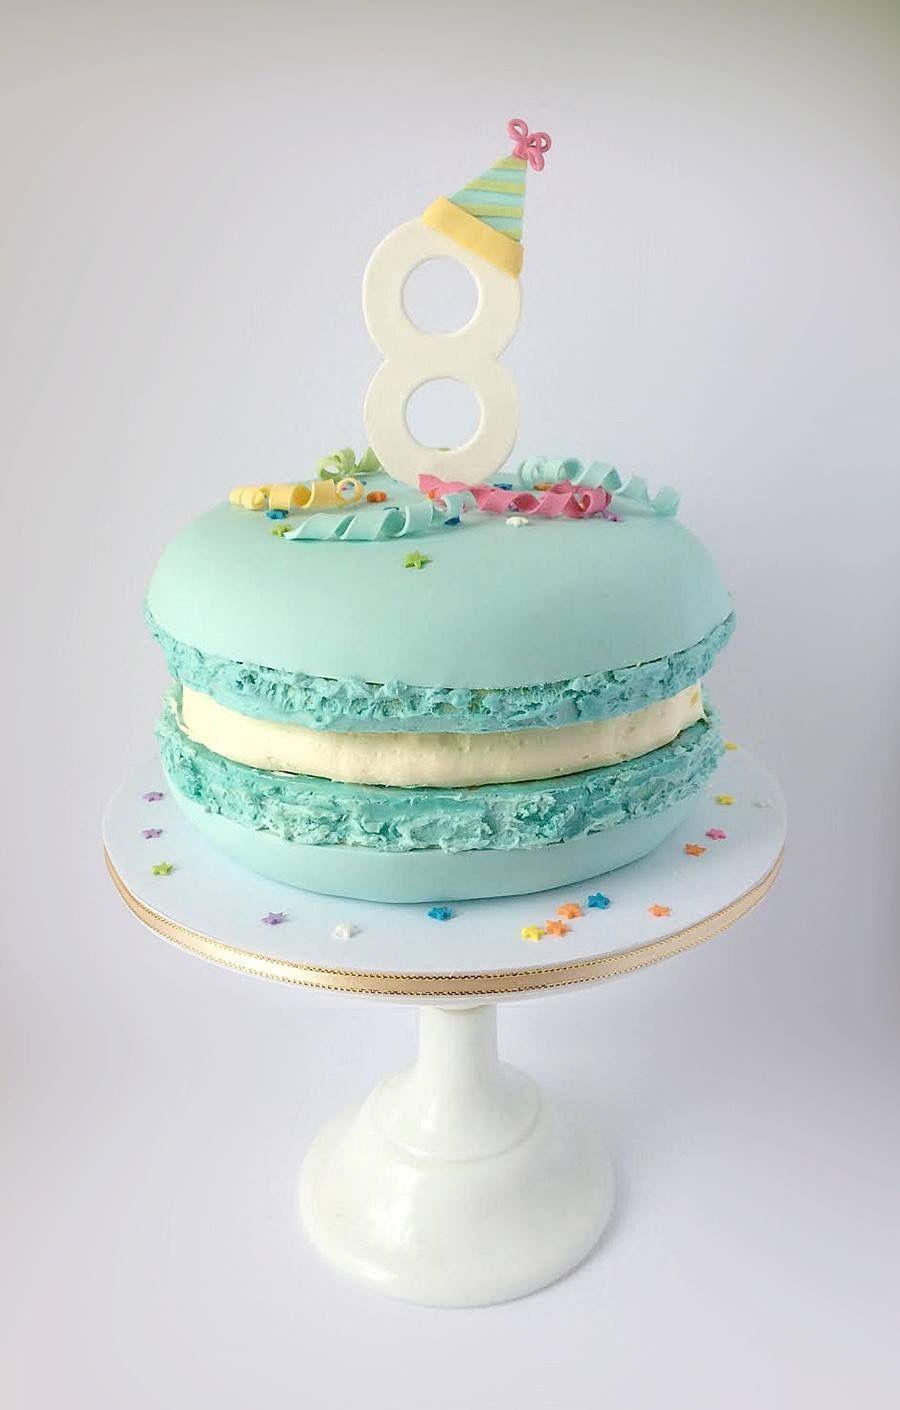 Macaroon 8th Birthday Cake By Edible Art Artist Catherine Beddall